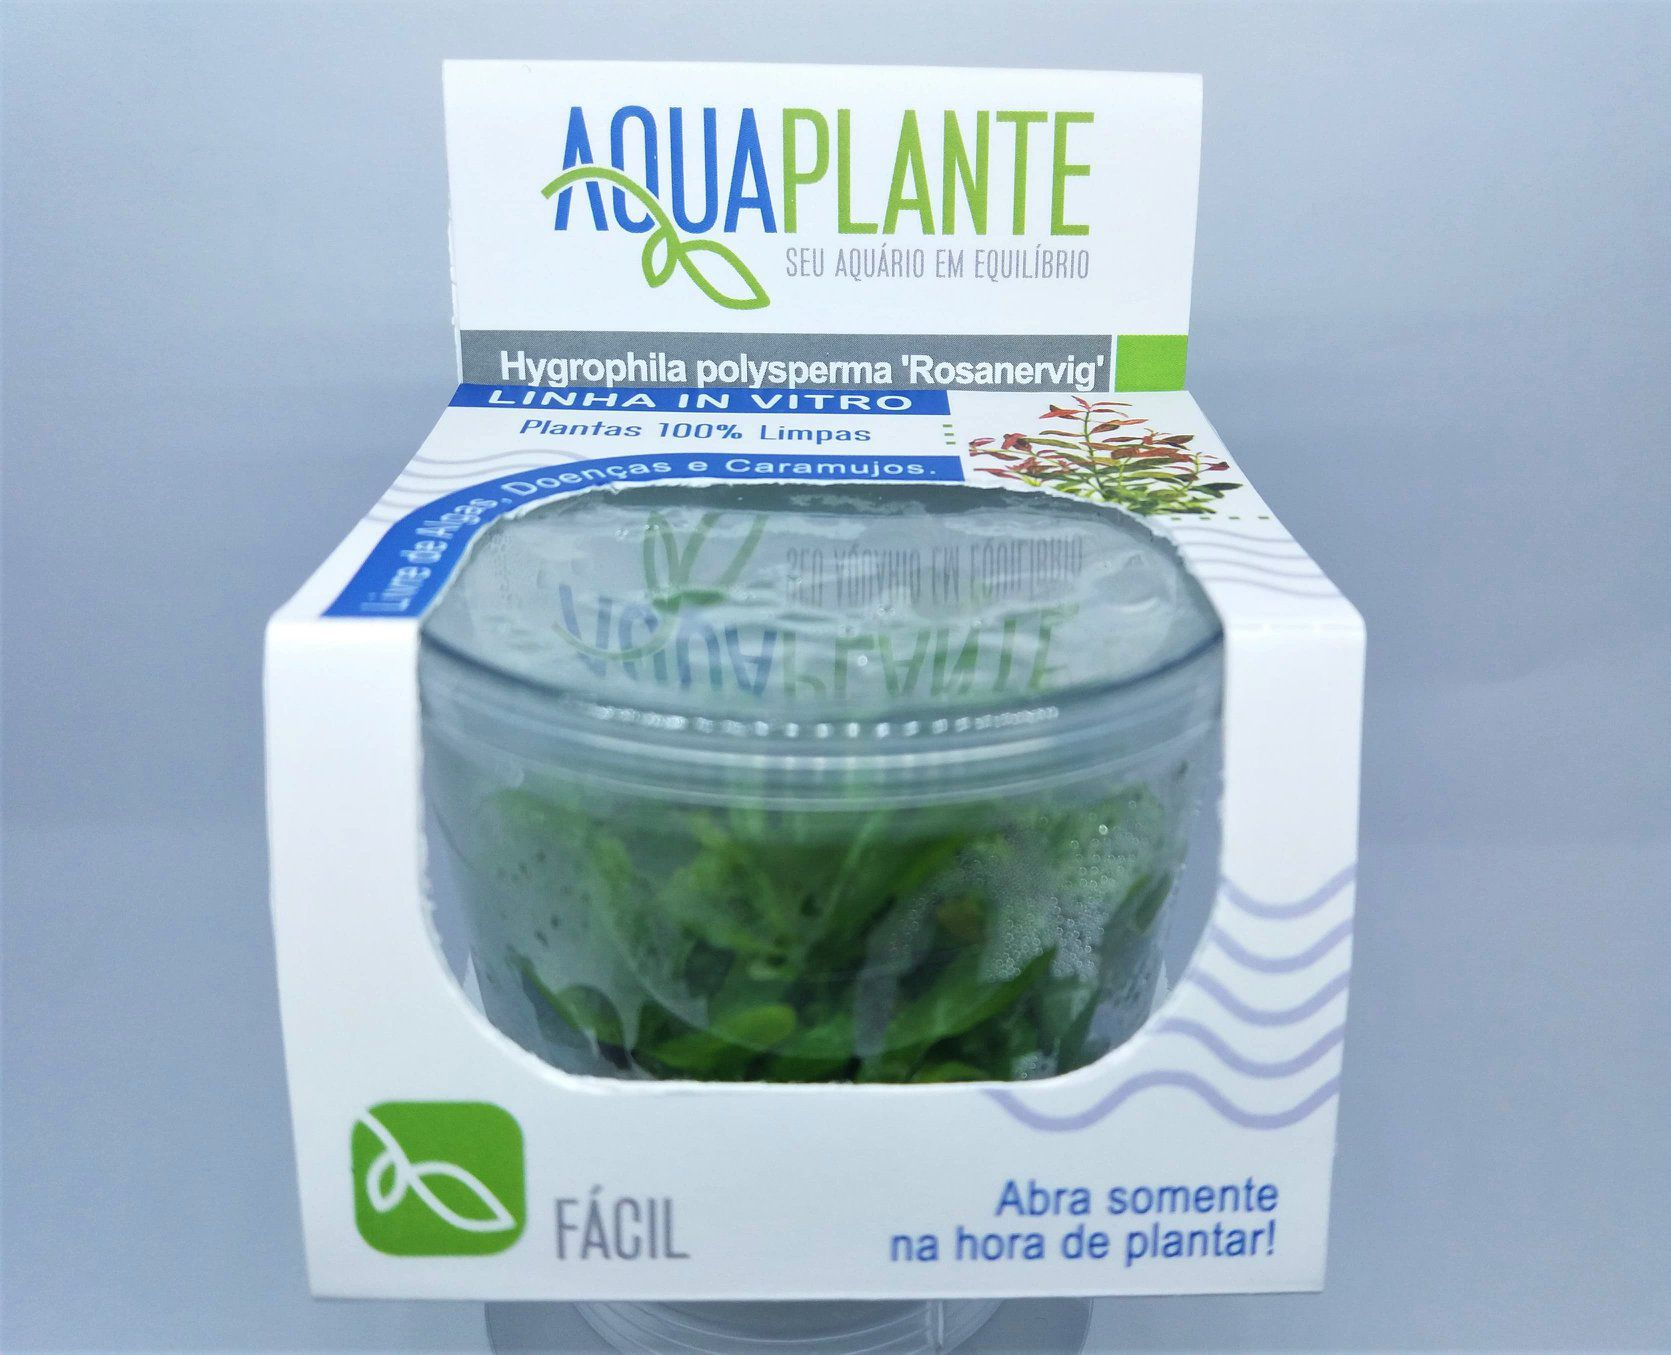 HYGROPHILA POLYSPERMA Rosanervig  'In vitro planta 100% LIVRE de pragas e algas'